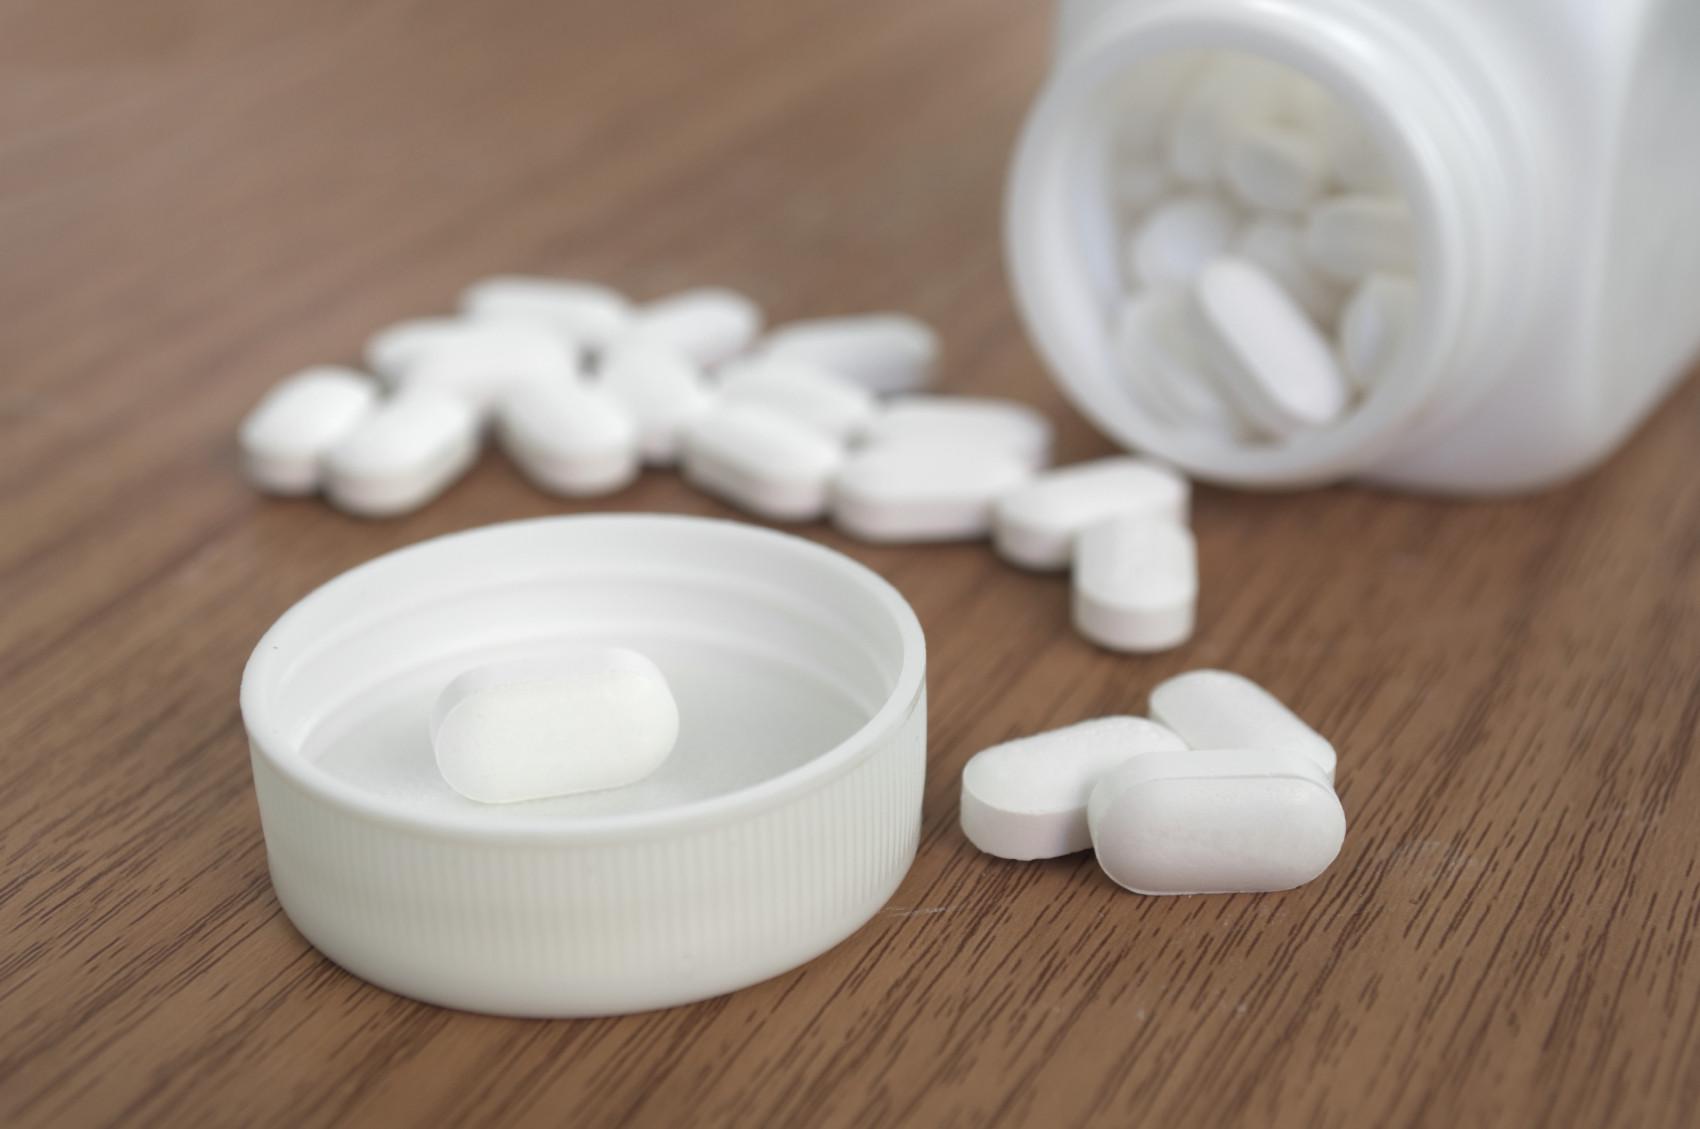 perscription-pain-killers-opioidsiStock_000049475354_Medium